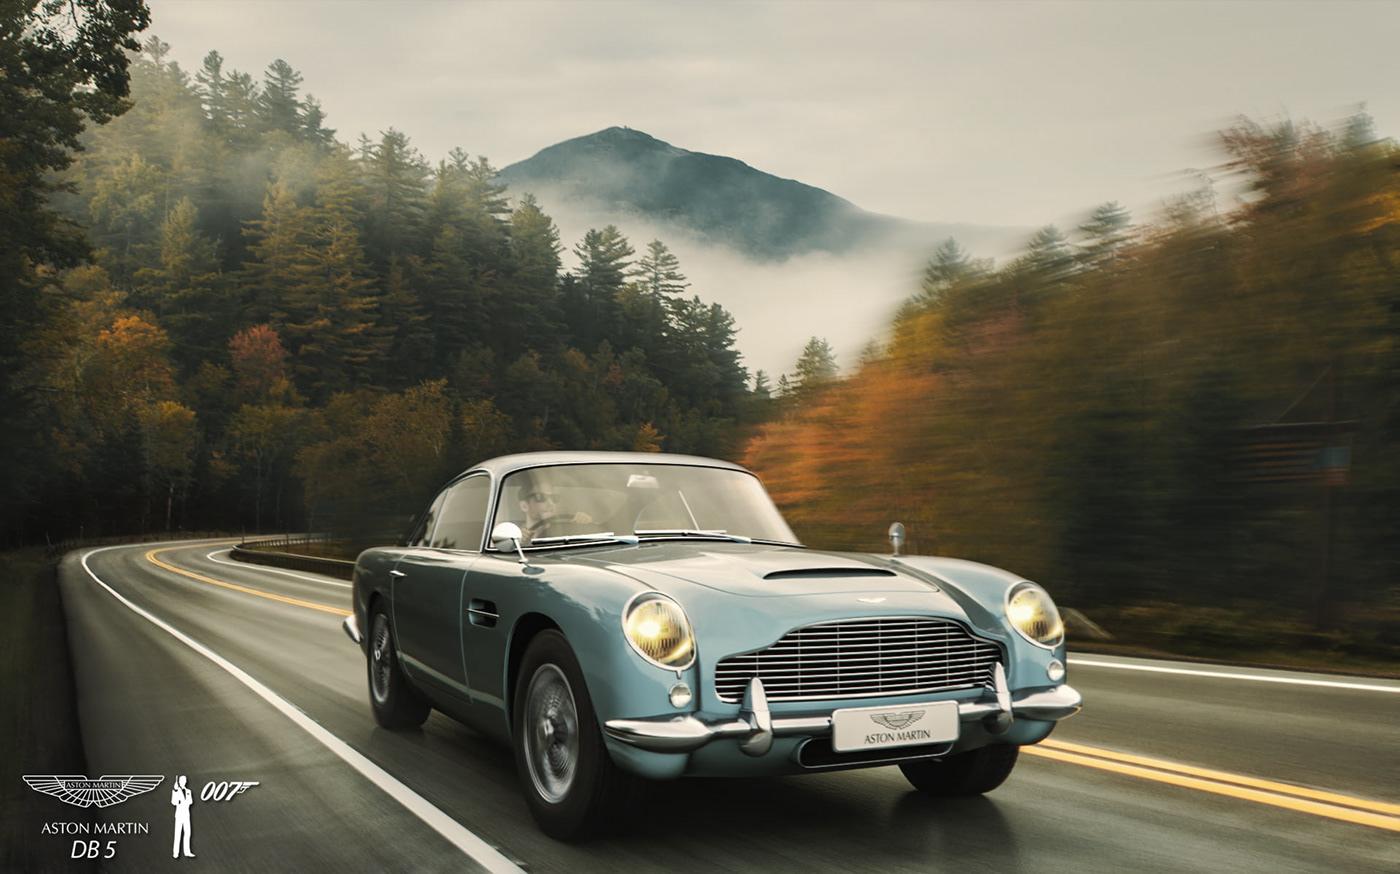 Aston Martin DB5 James Bond car